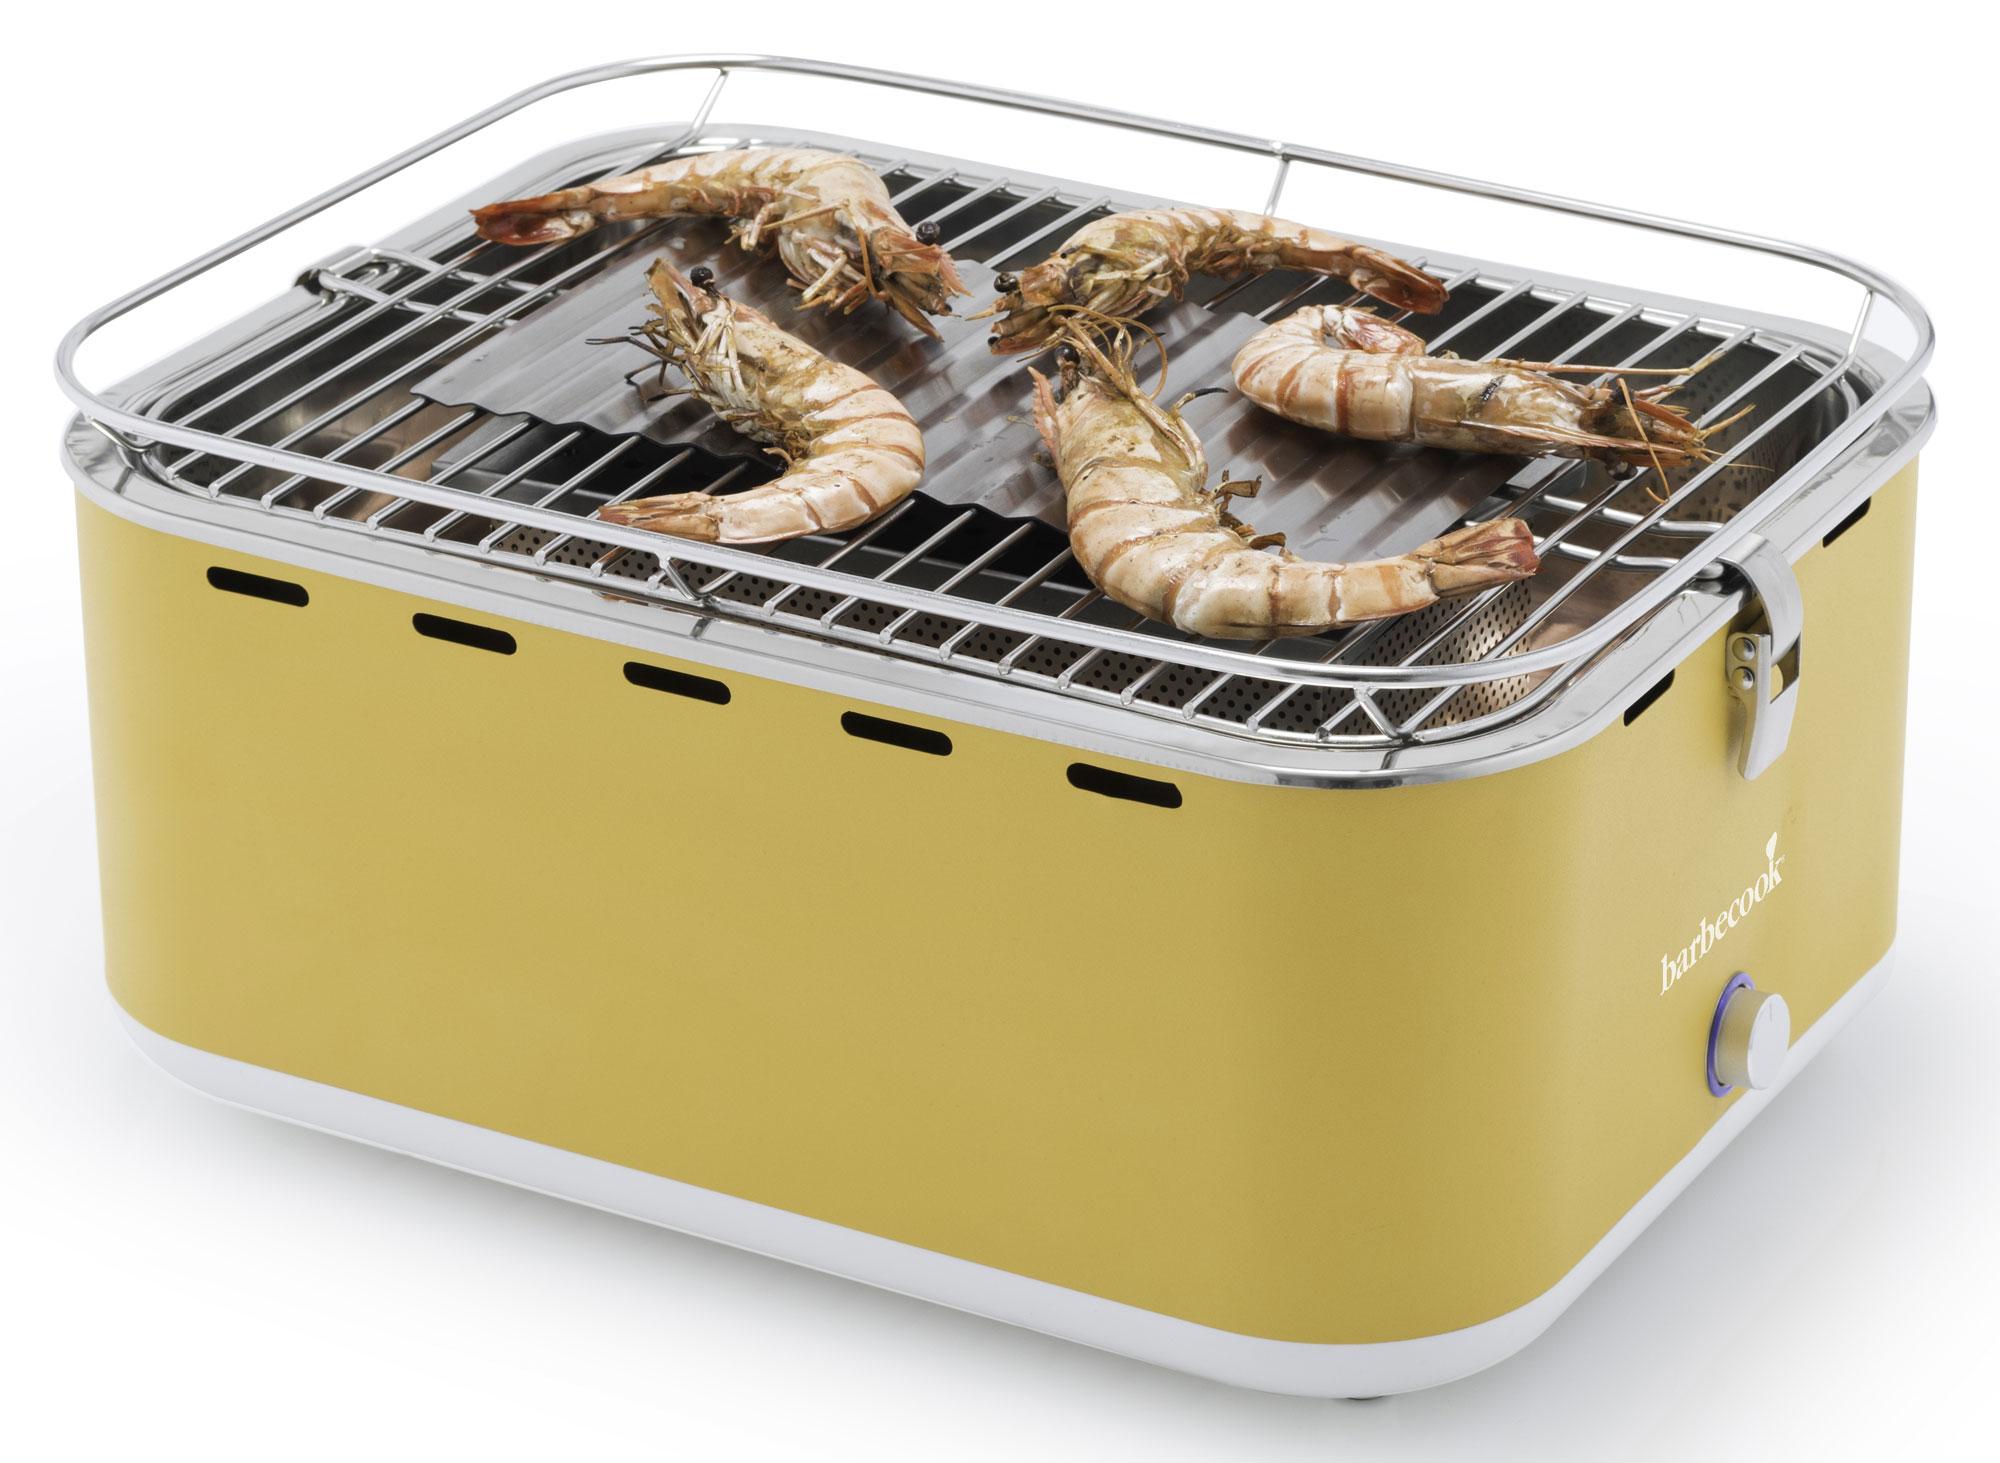 Campinggrill / Rauchfreier Grill barbecook Carlo m. Tasche 38,5x28,5cm Bild 4